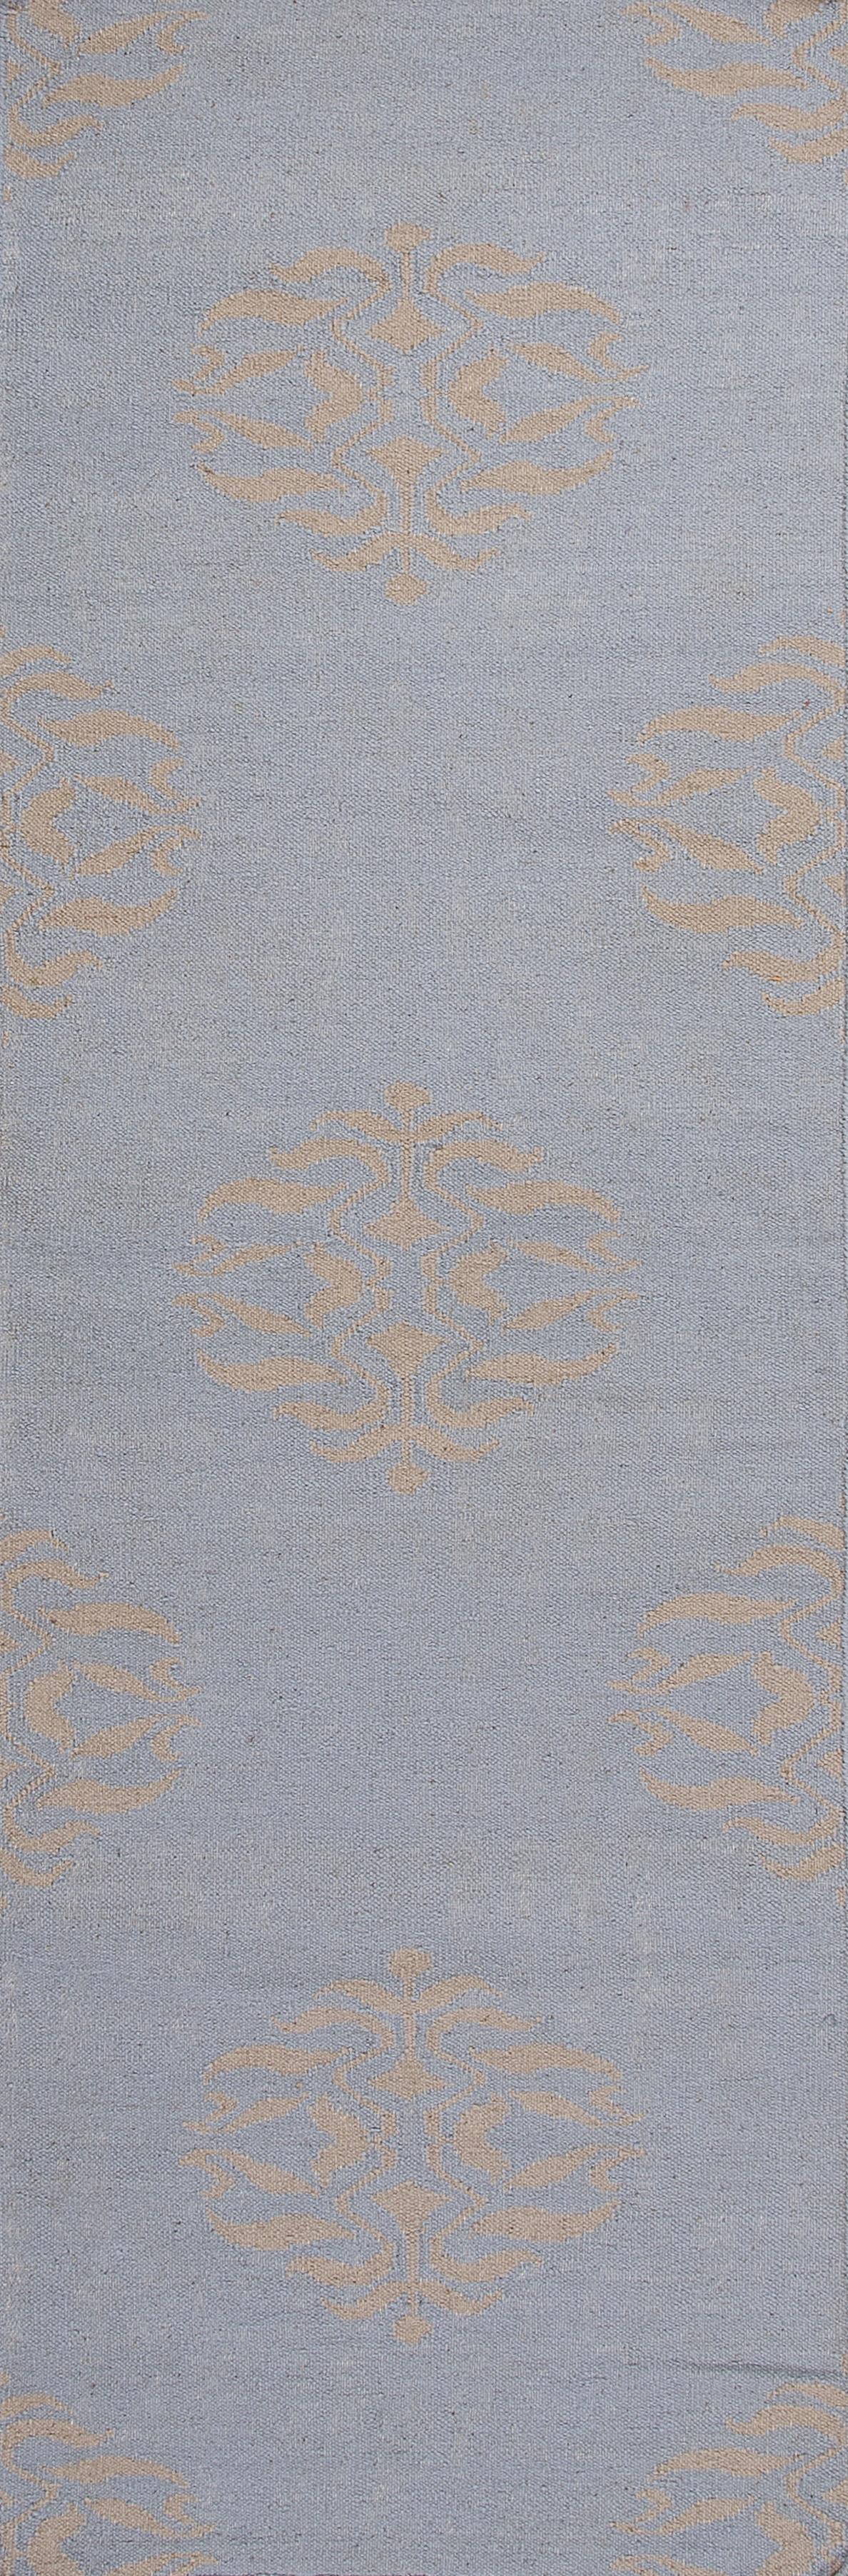 JAIPUR Rugs Maroc 2.6 x 8 Rug - Item Number: RUG112168